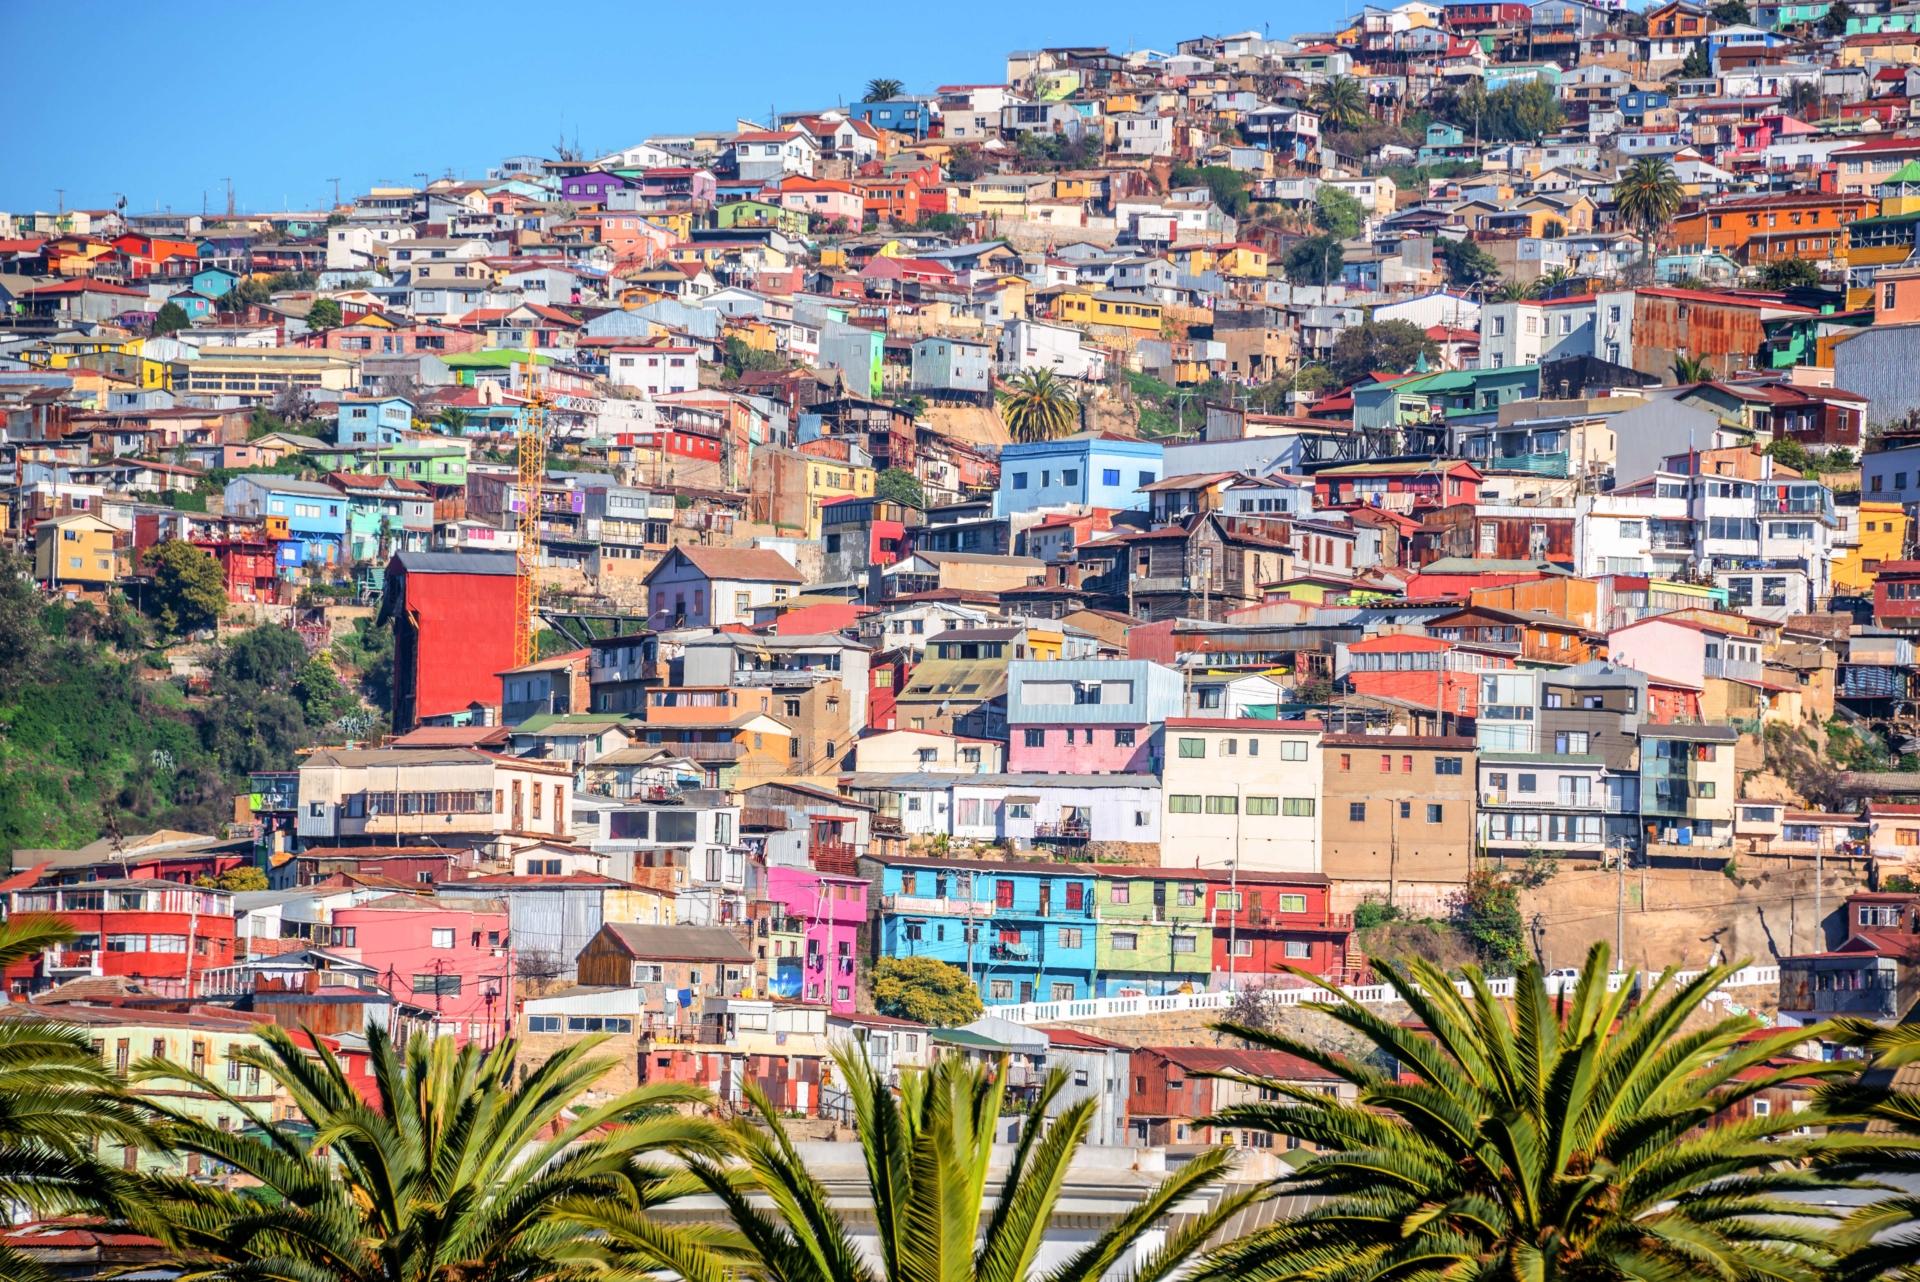 valparaiso-maisons-chili